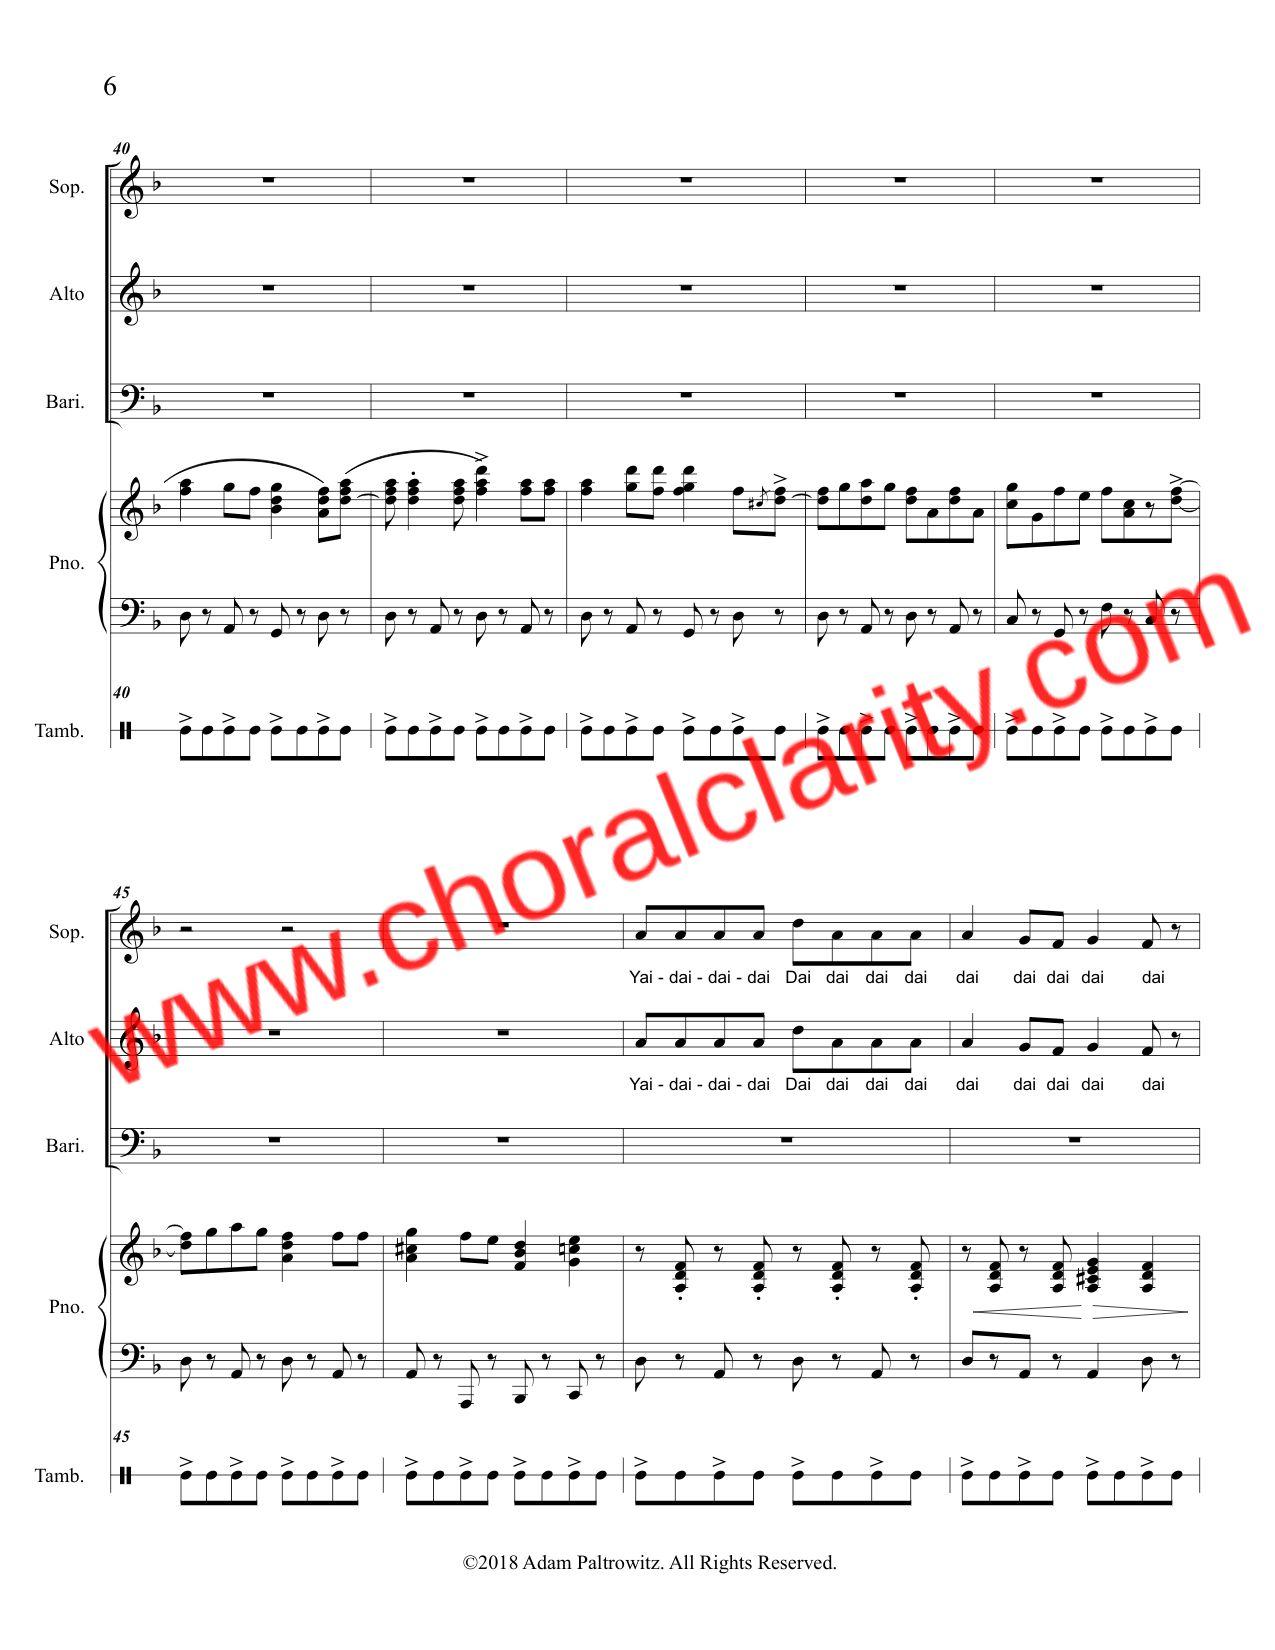 Choral Clarity WatermarkOh Hanukkah SAB-6